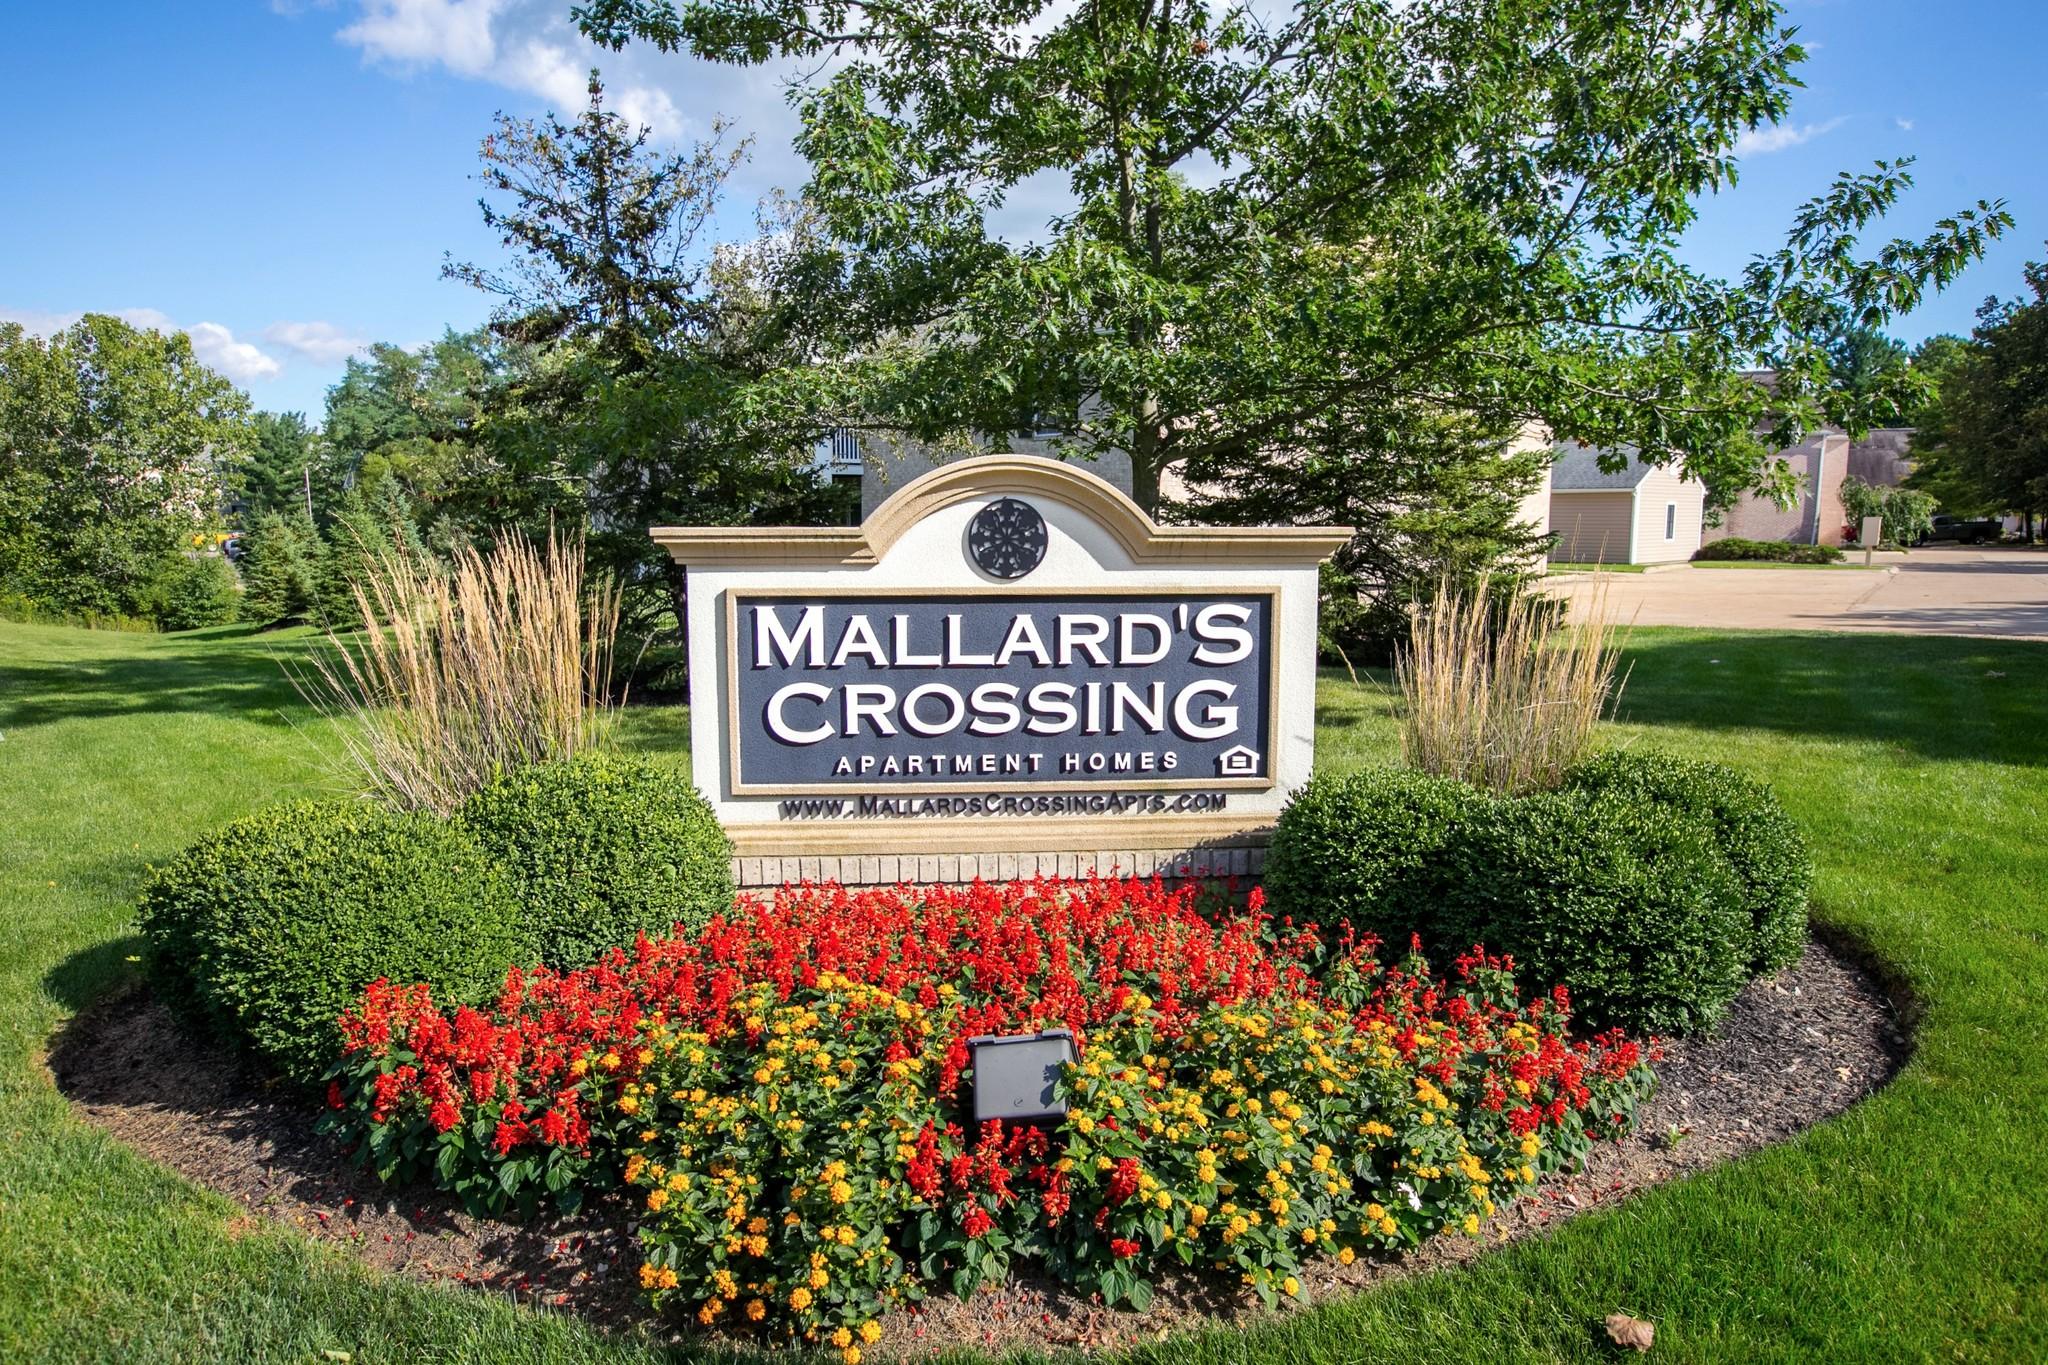 Mallard's Crossing Apartments image 4